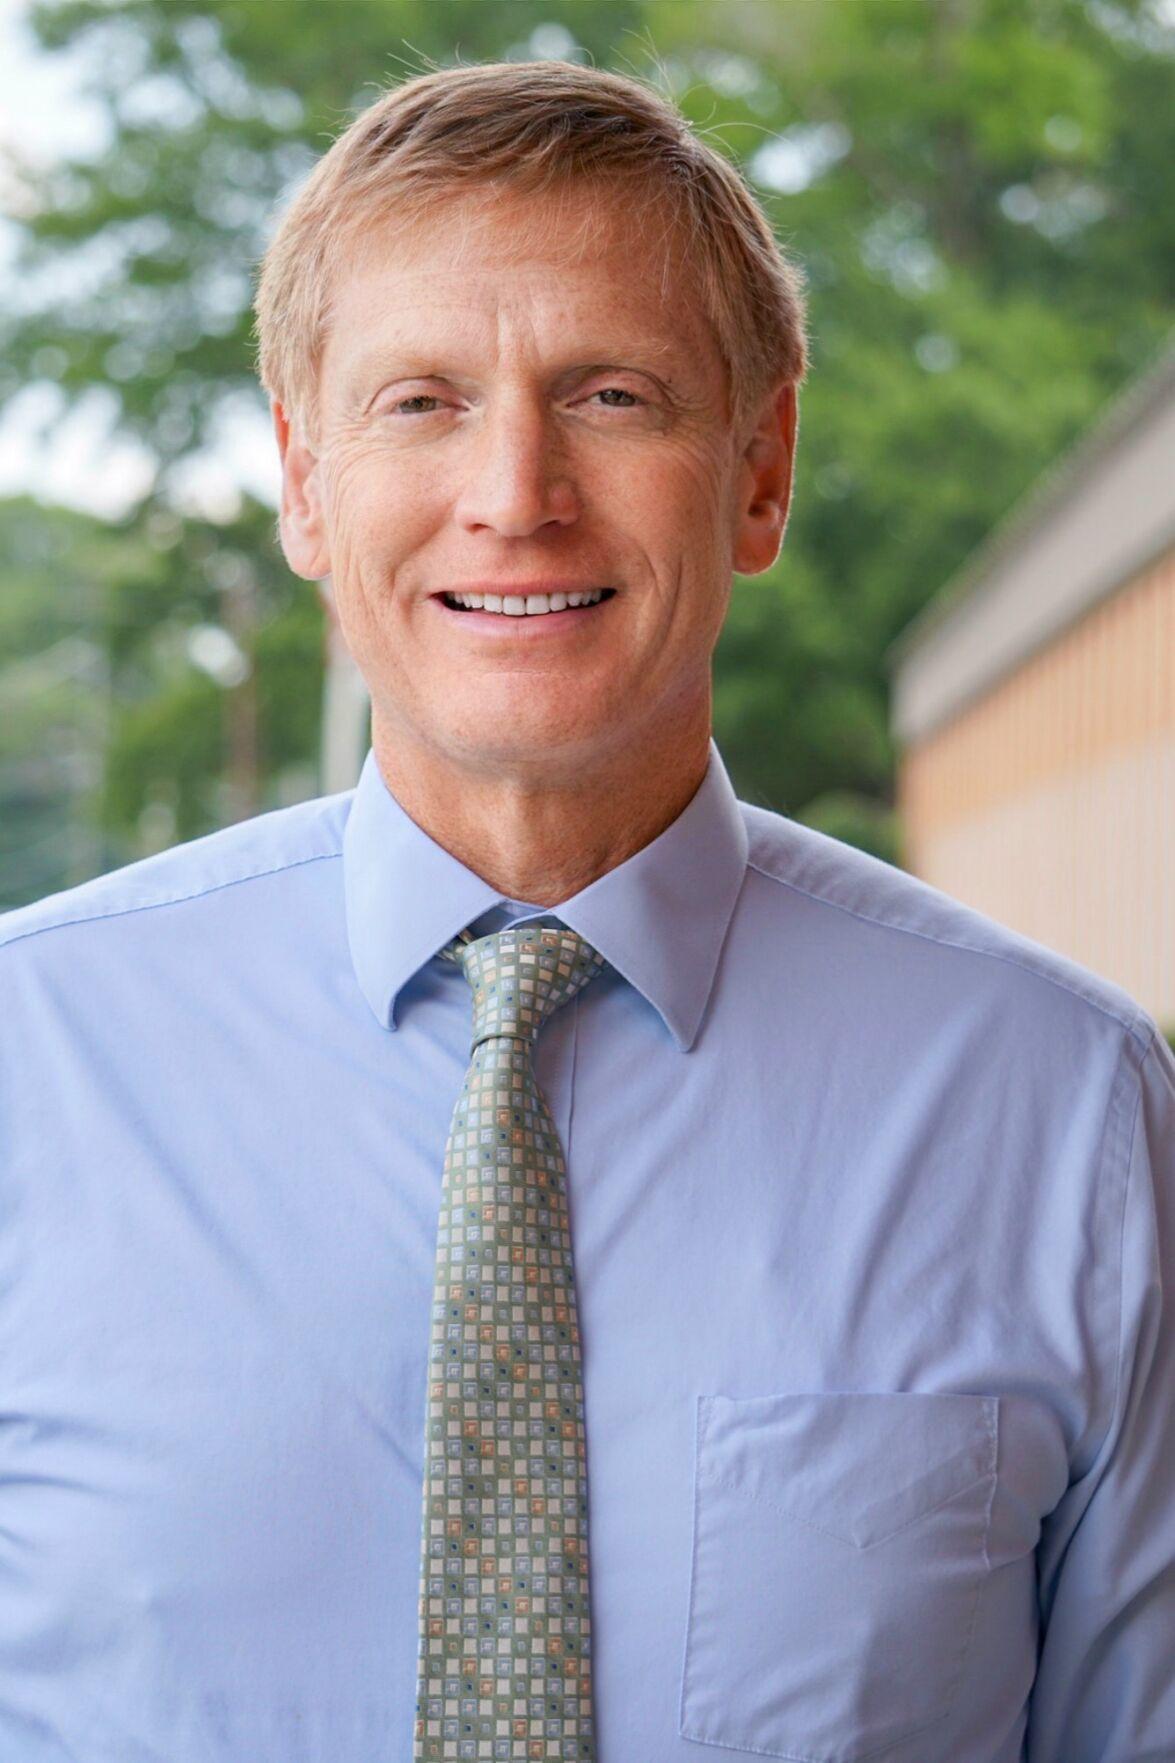 Glenn White, Floyd County Schools superintendent